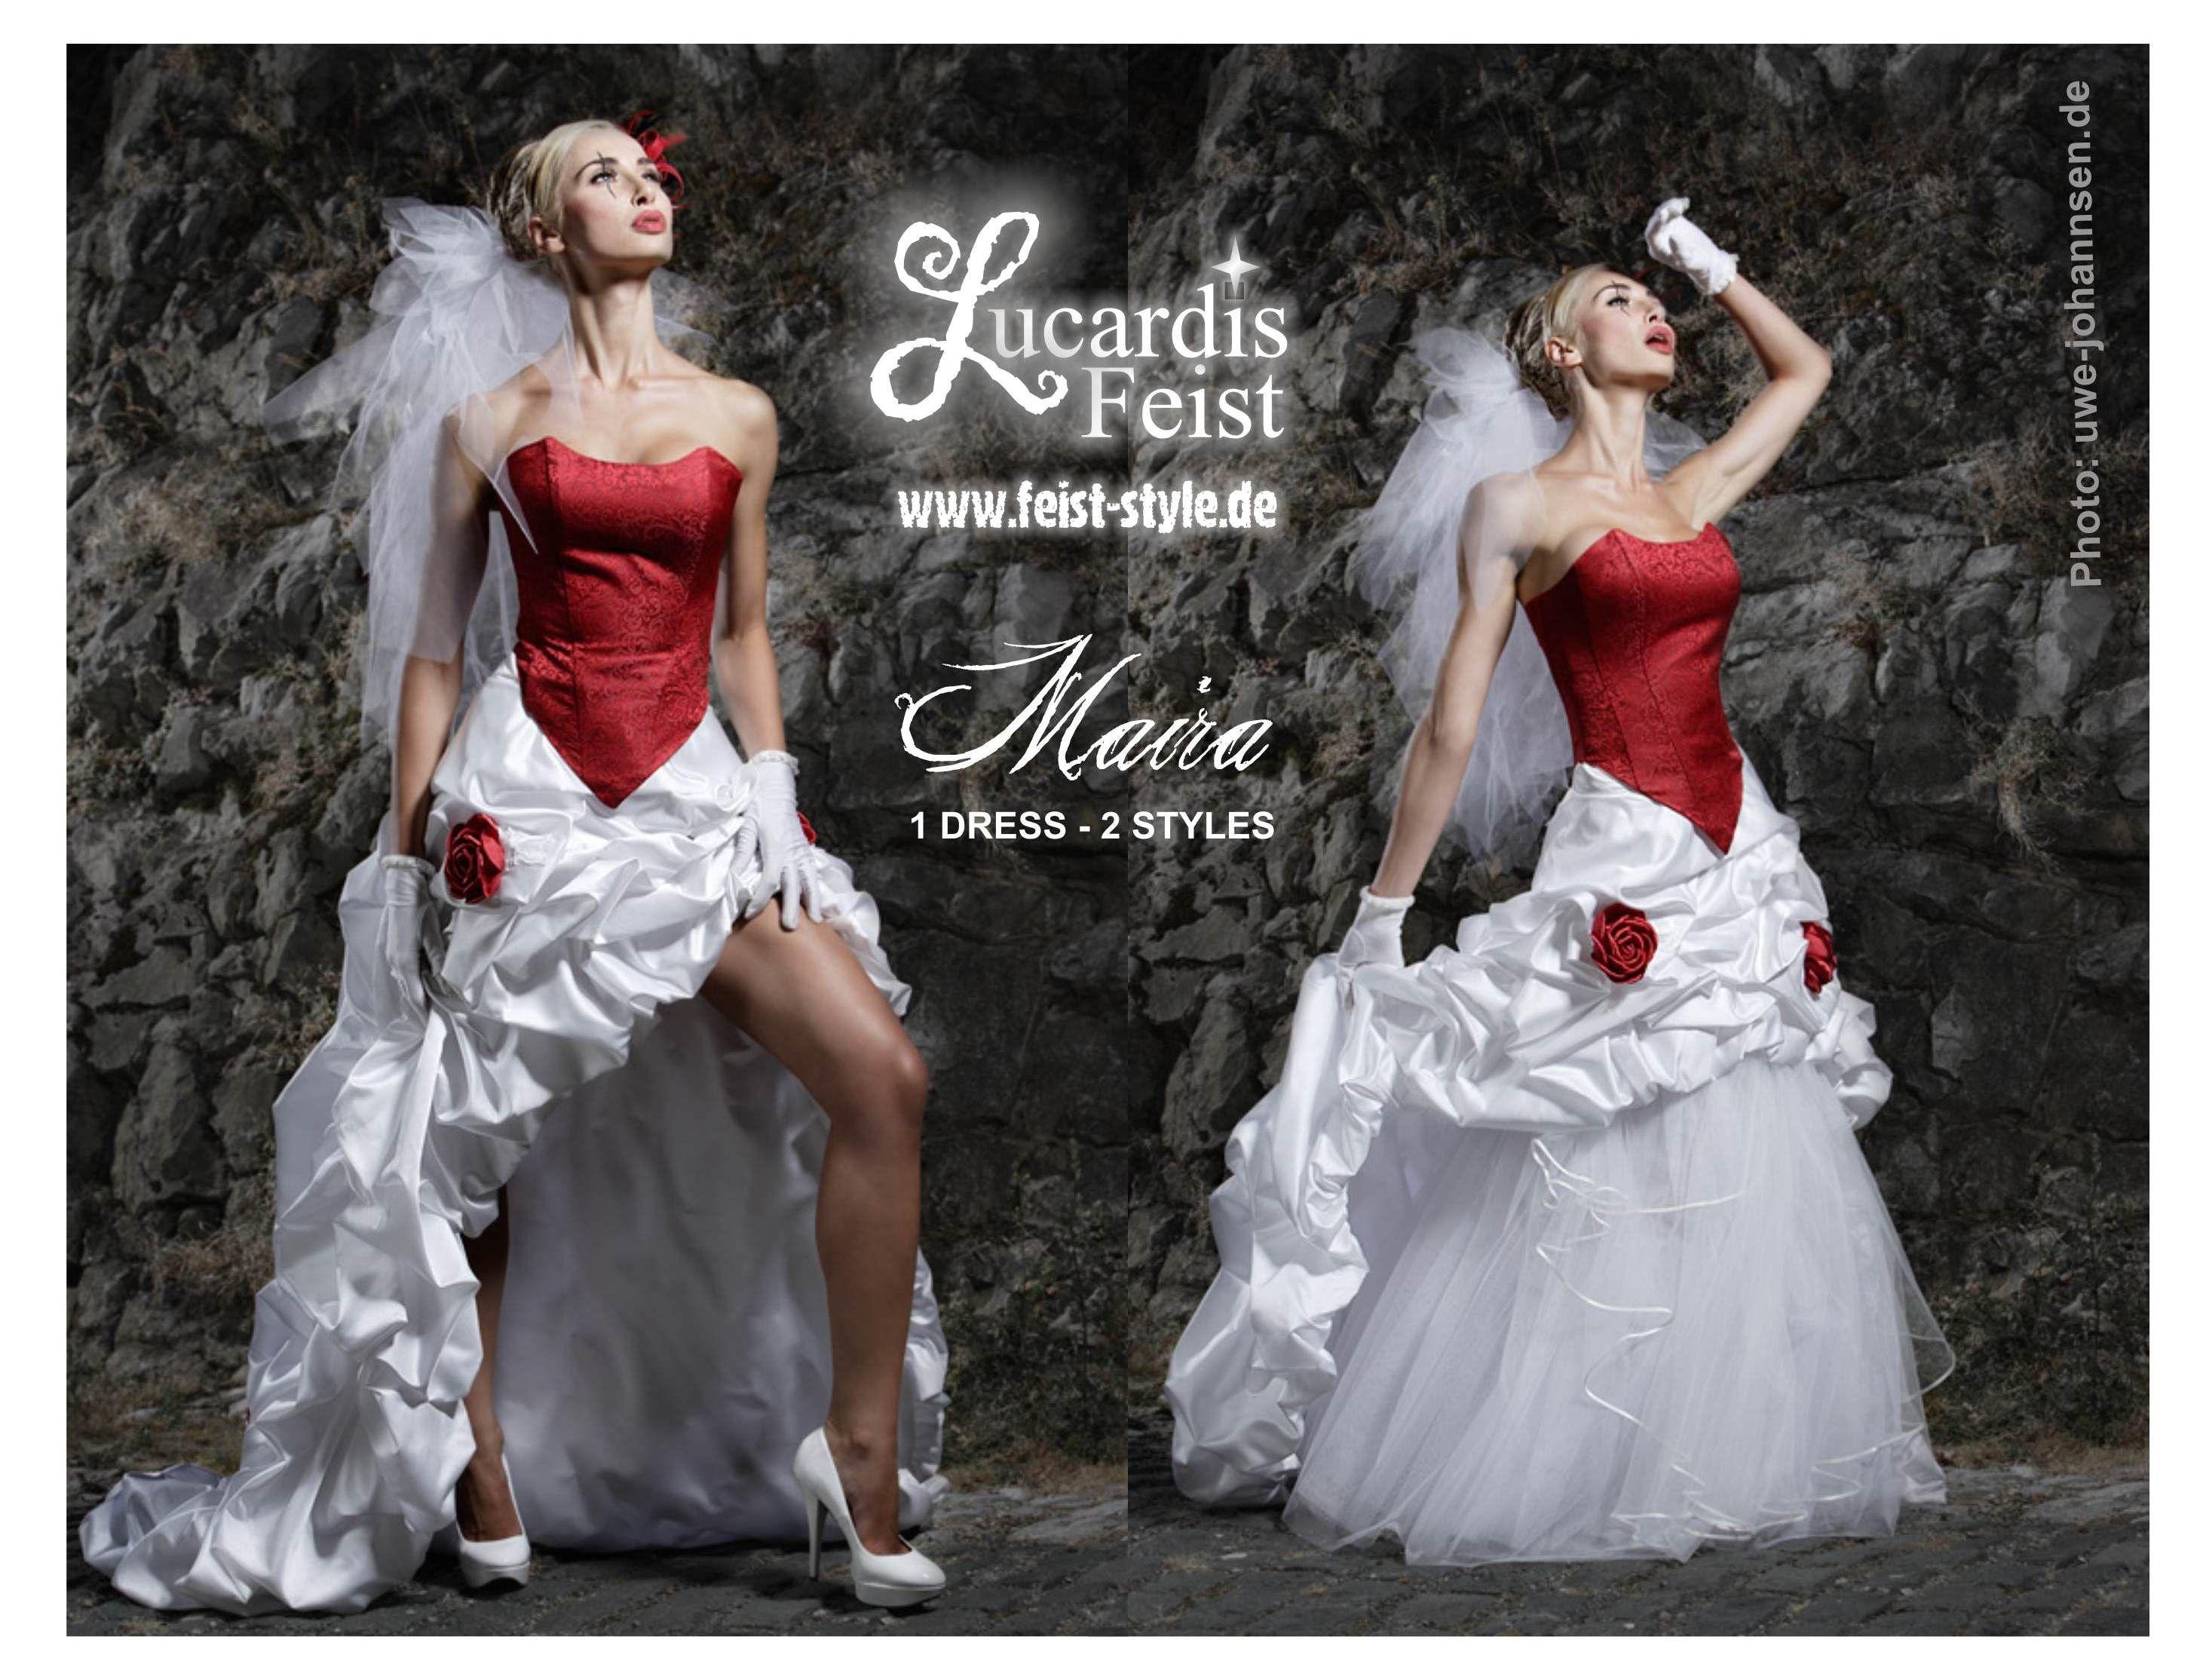 Lucardis Feist - Besondere Brautmode. Extravagantes Brautkleid in